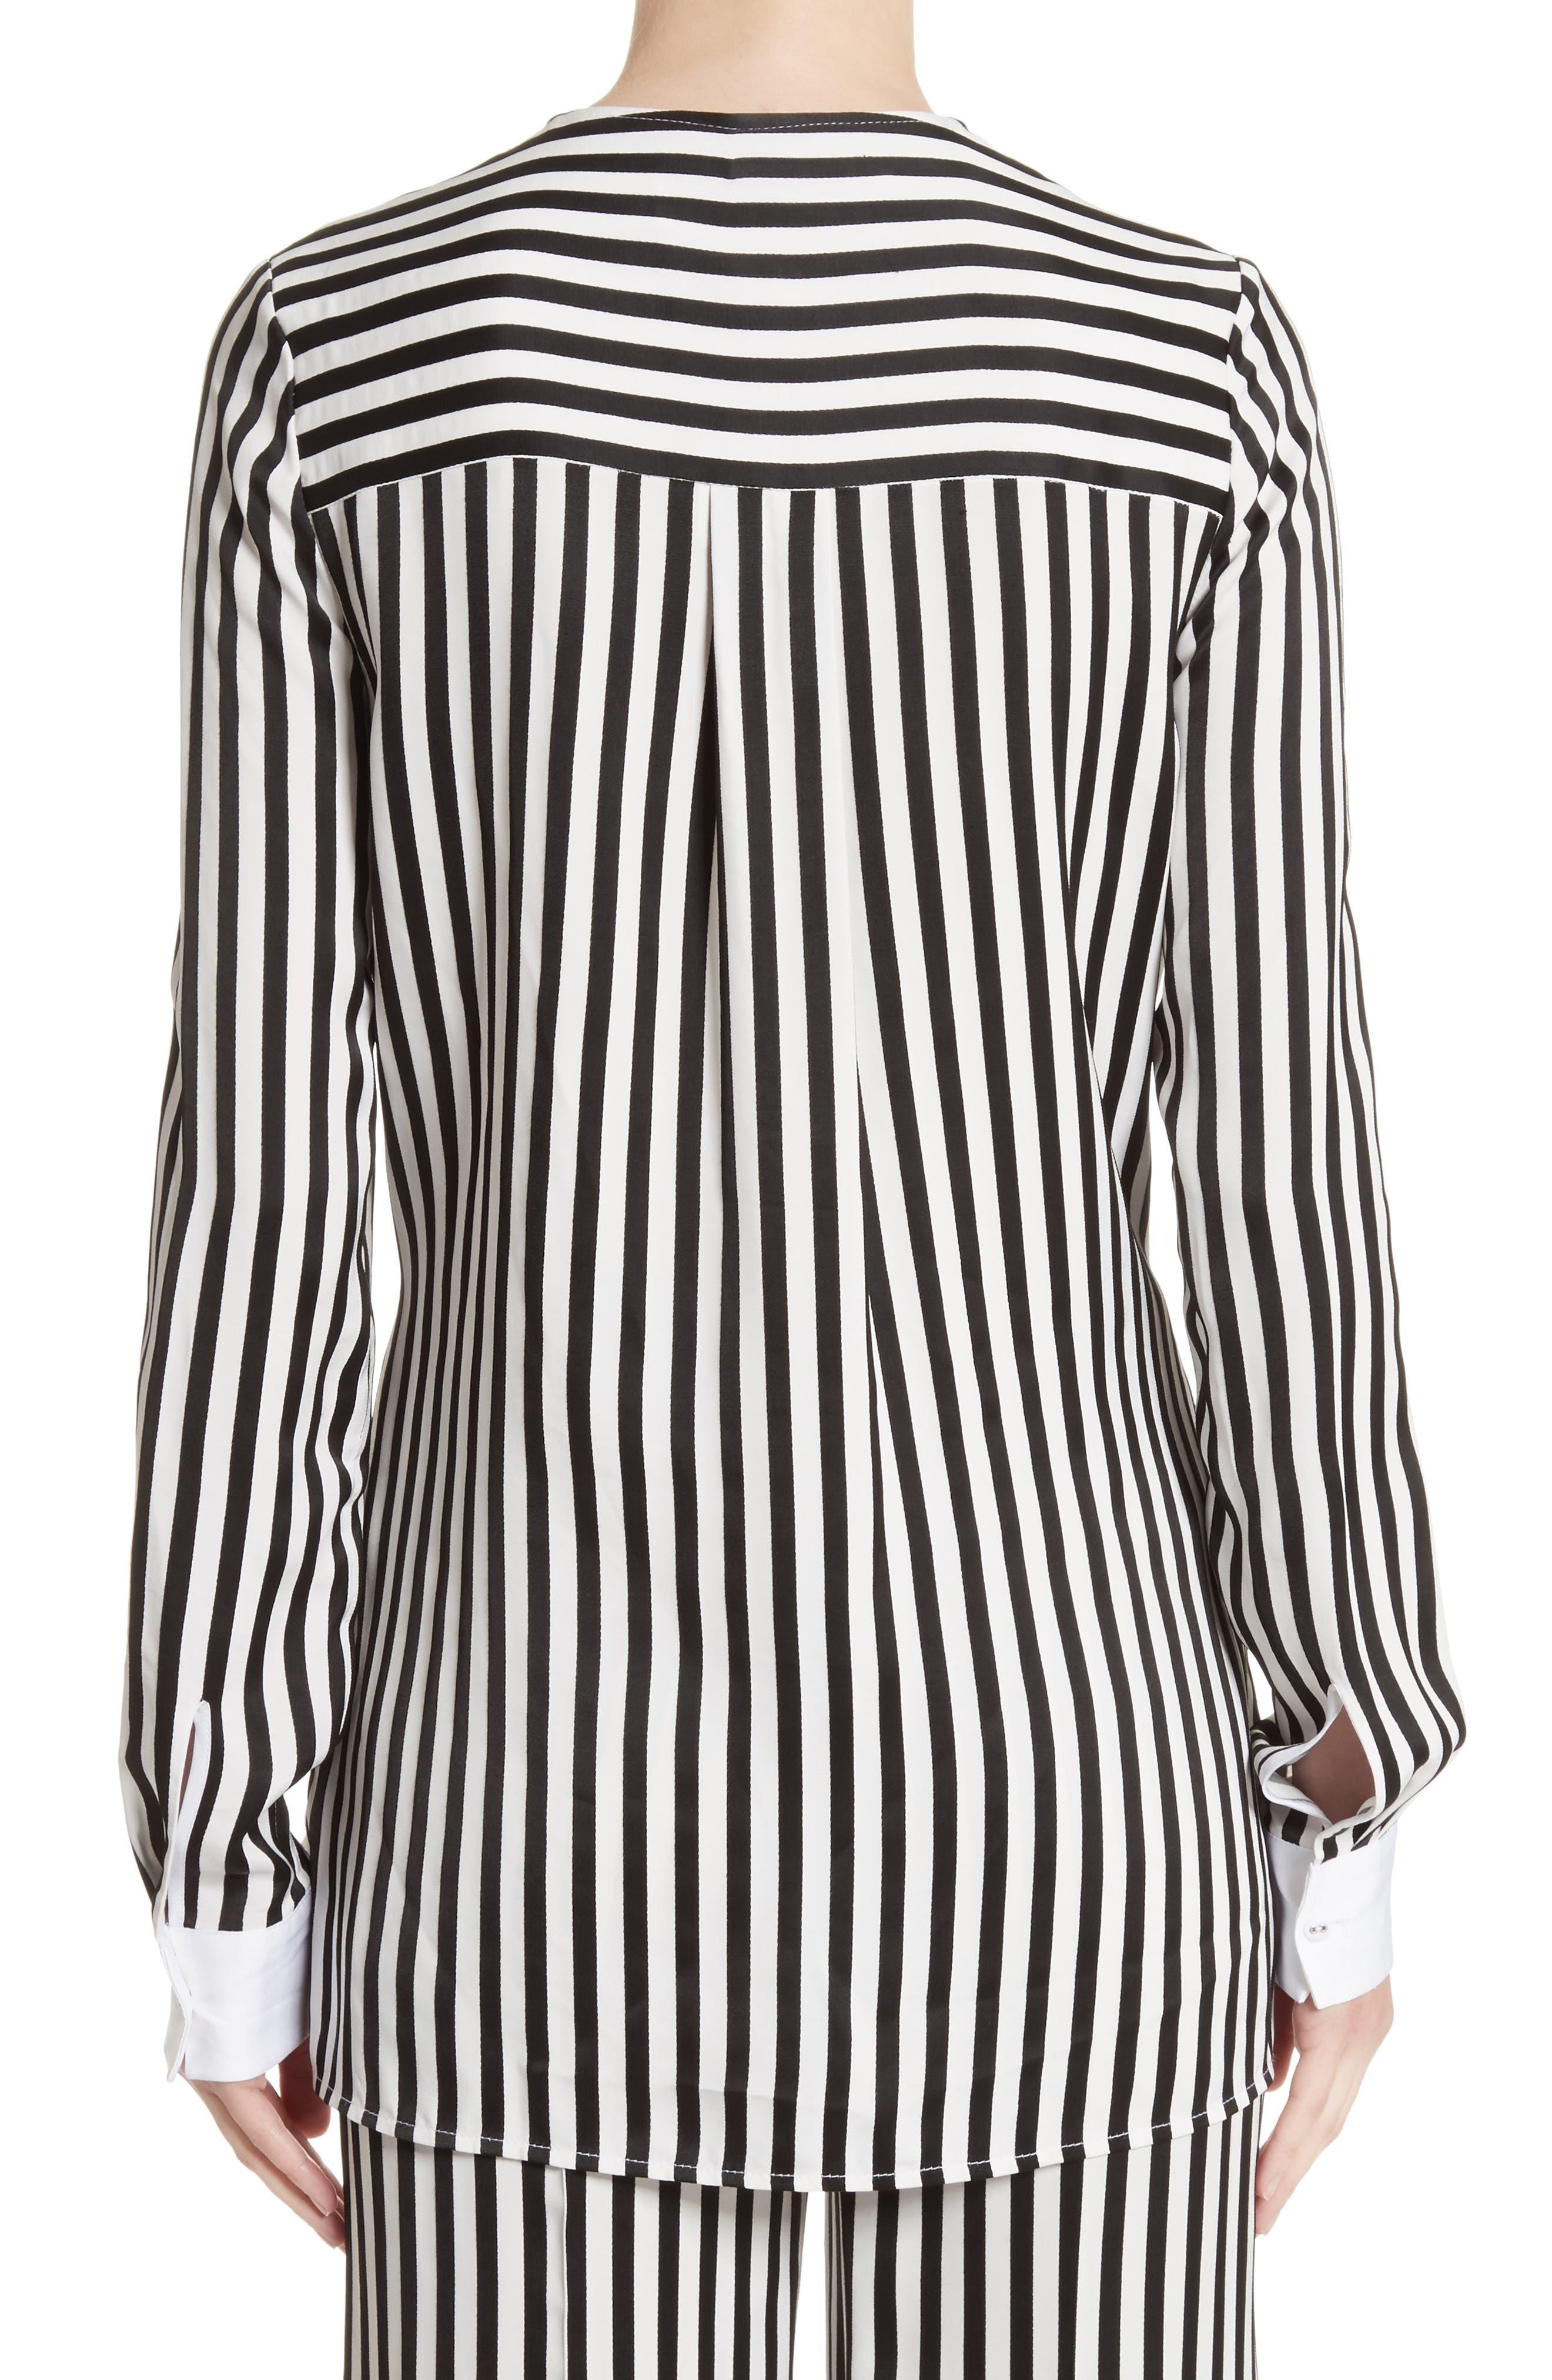 Stripe Tie Waist Blouse,                             Alternate thumbnail 3, color,                             Black/ White